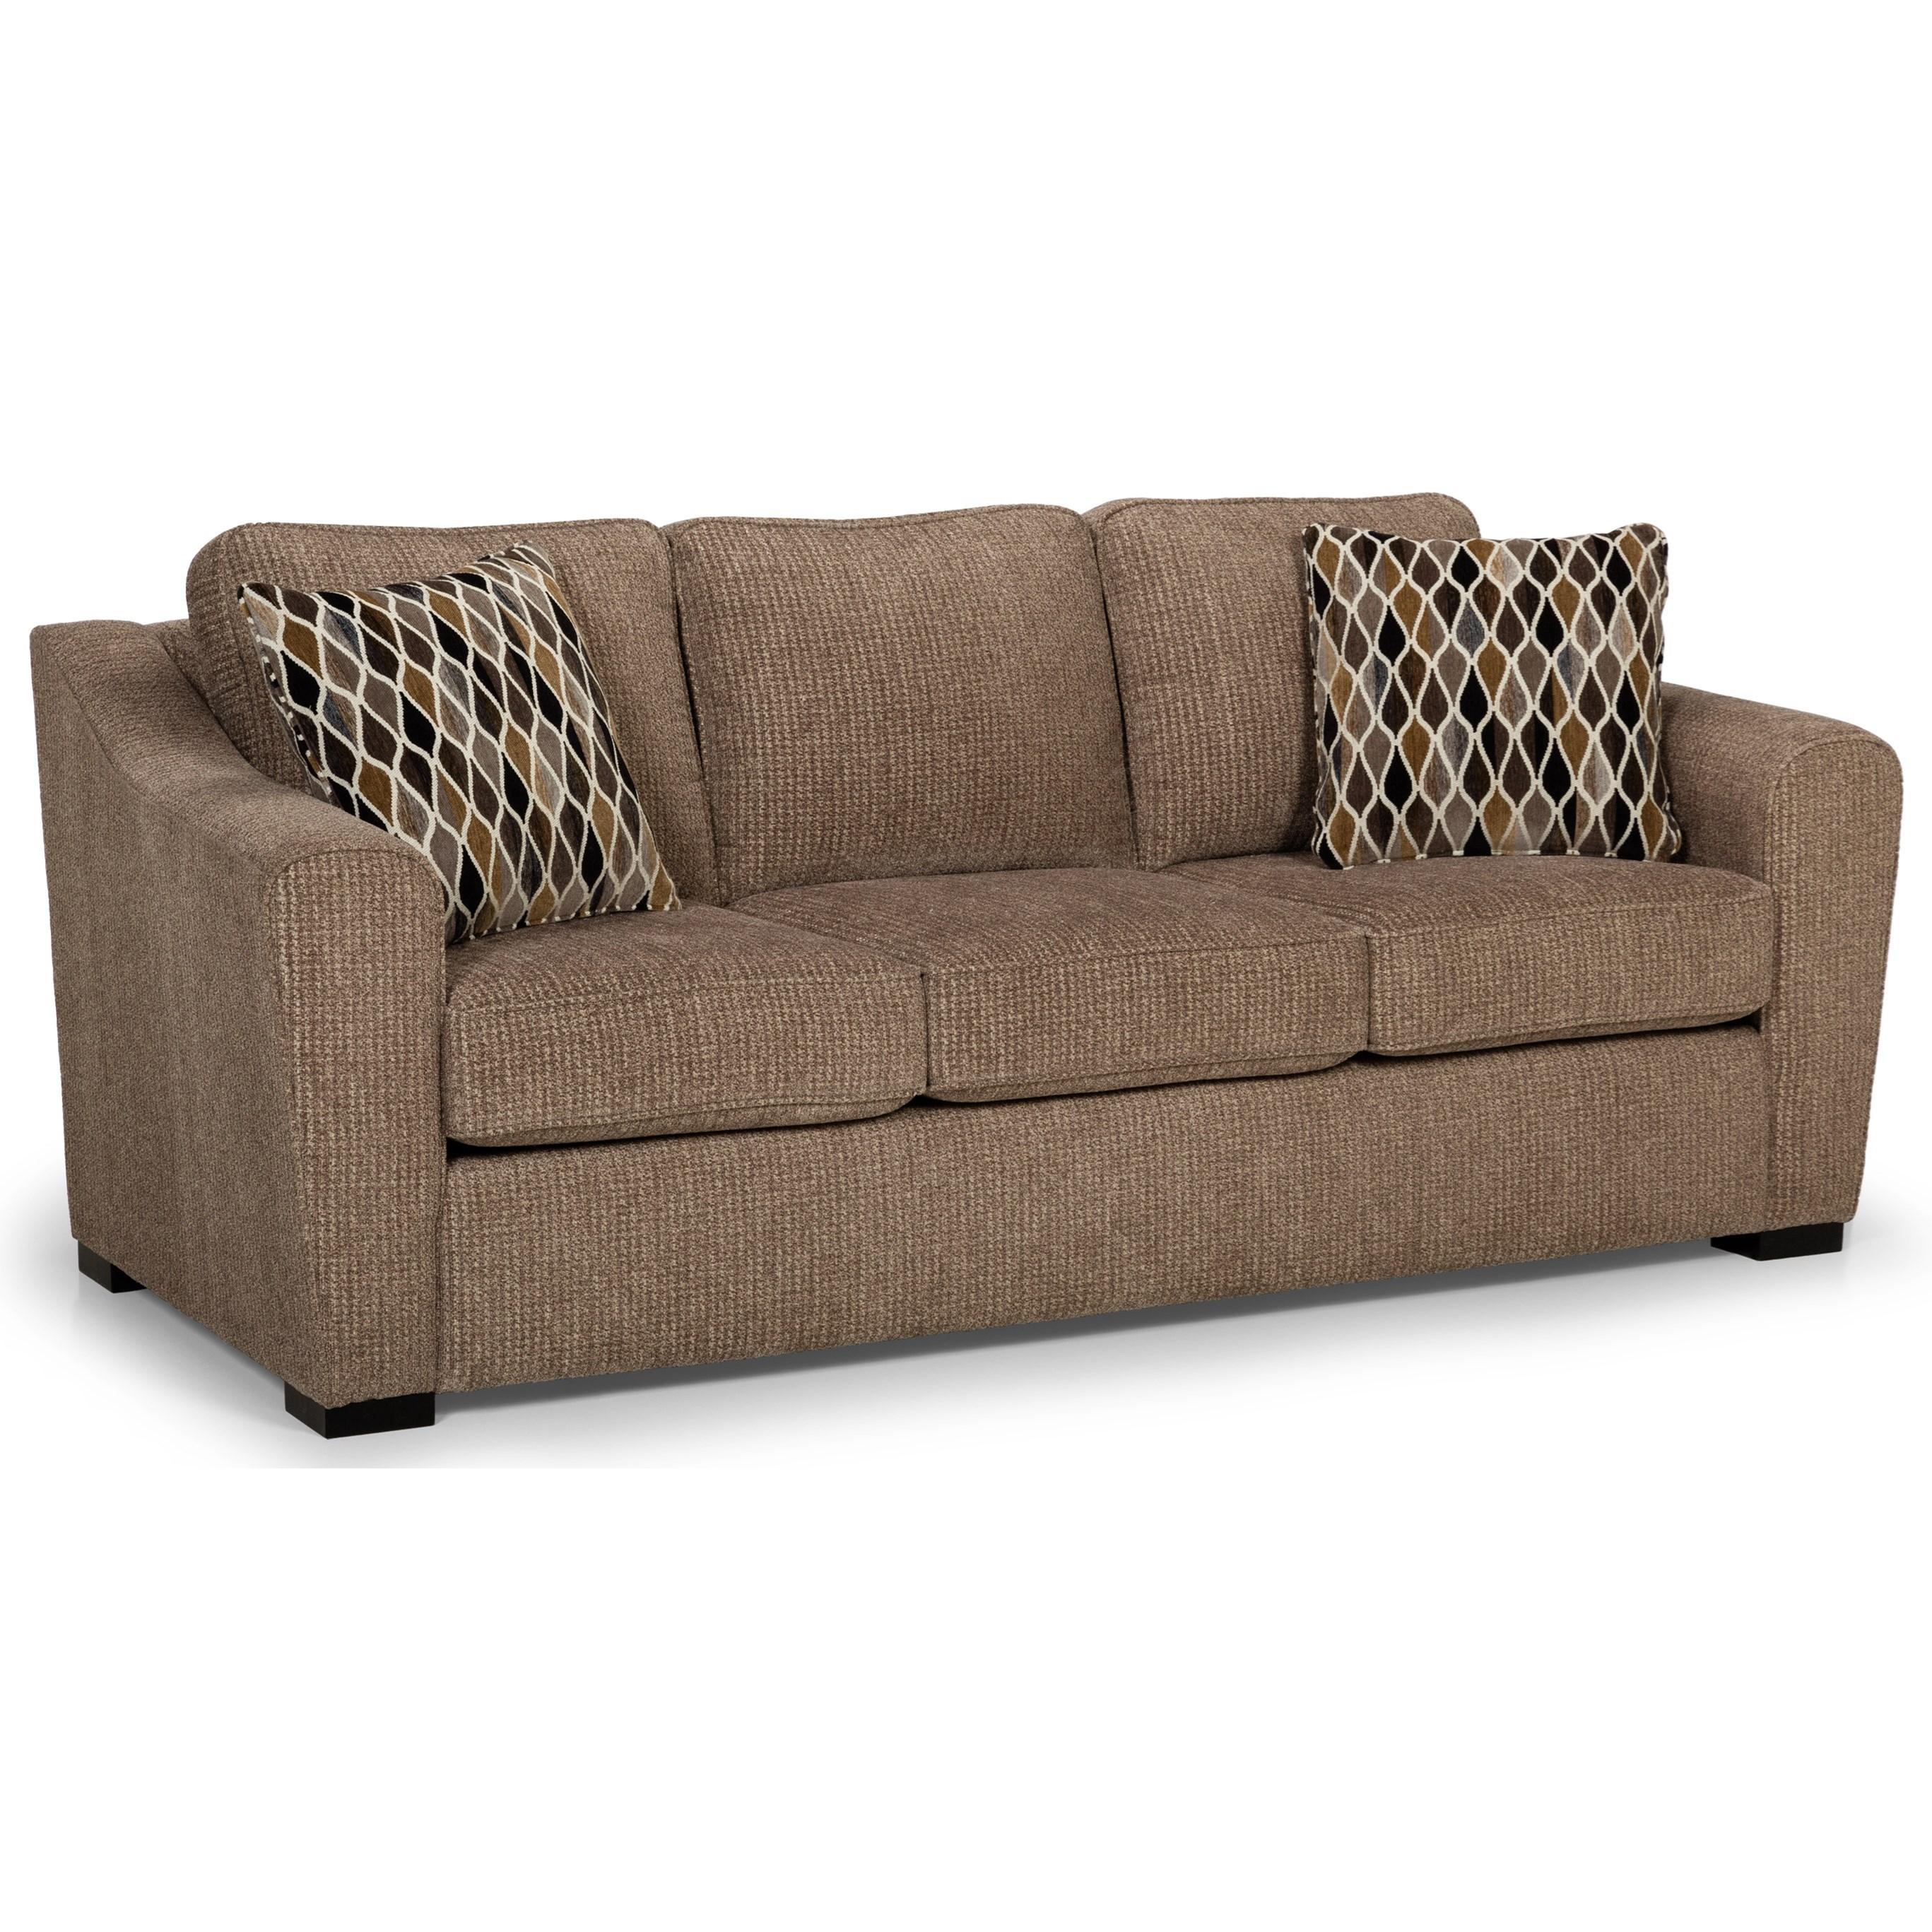 Sleeper Sofa with Gel Mattress